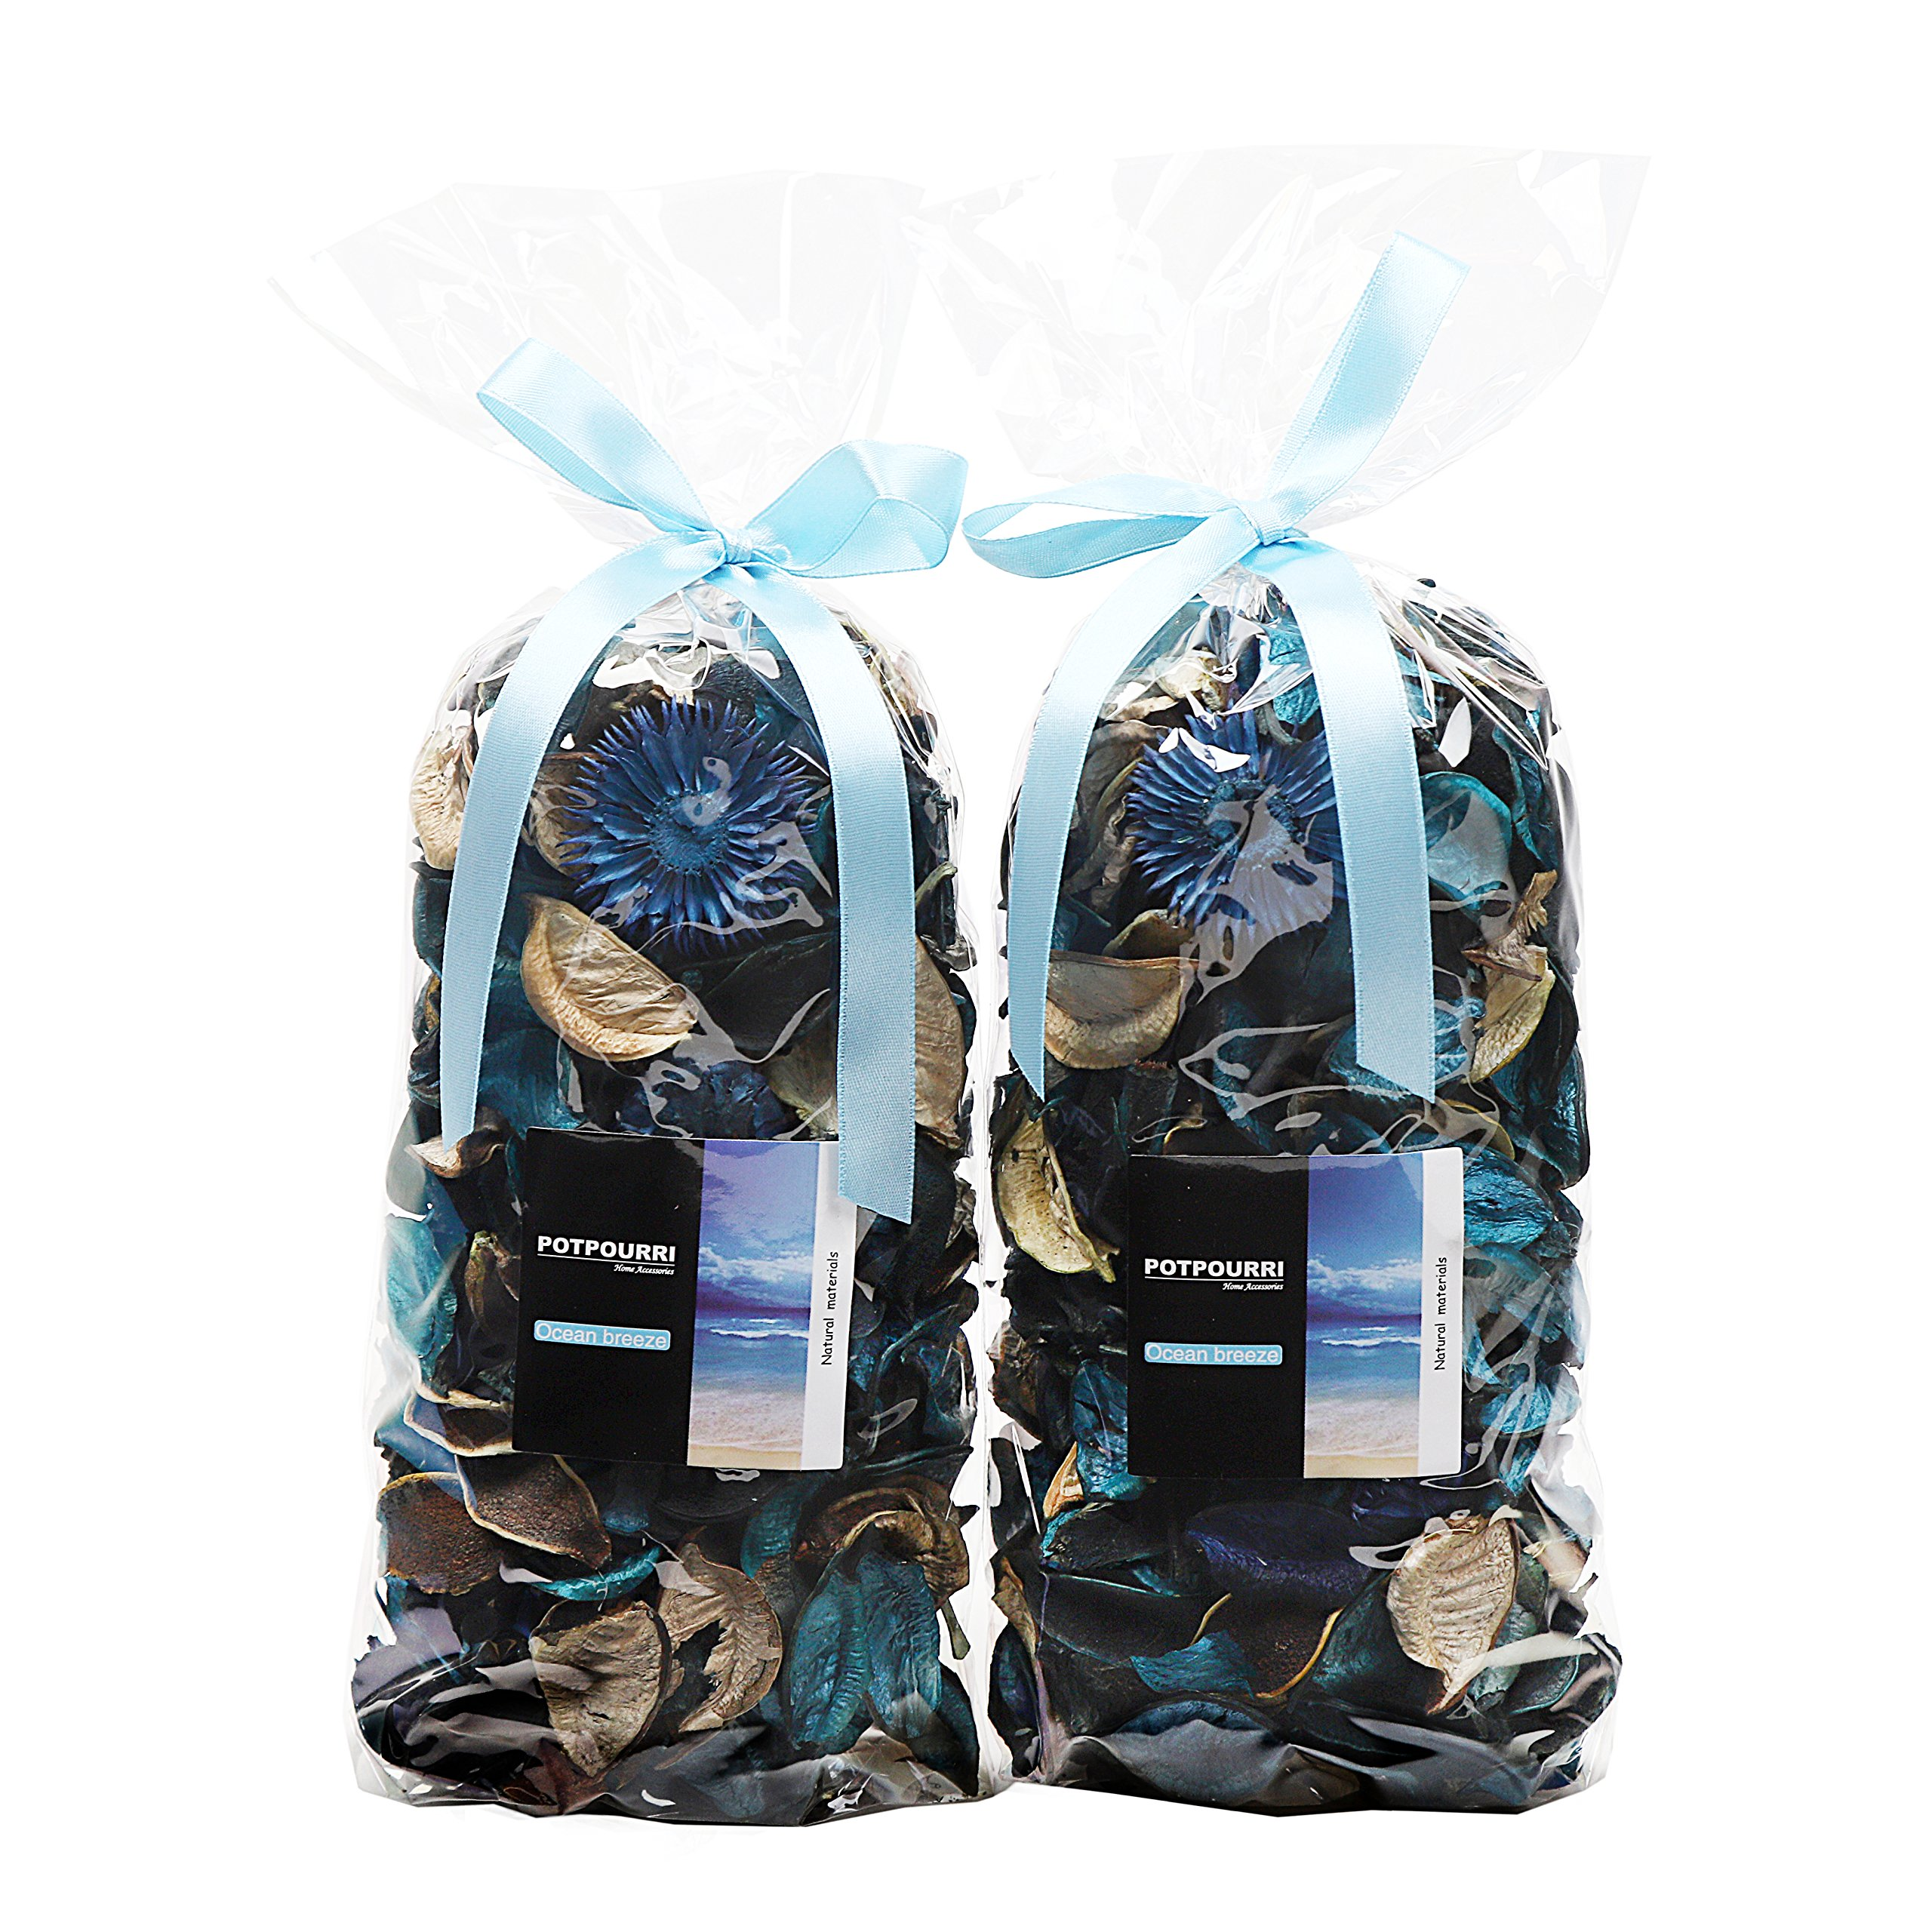 Qingbei Rina Gifts.Turquoise Fresh Potpourri Bag,Petal,Perfume Satchel,Decorate Bowl and Vase.Two Bags.8.4OZ. (Turquoise) by Qingbei Rina